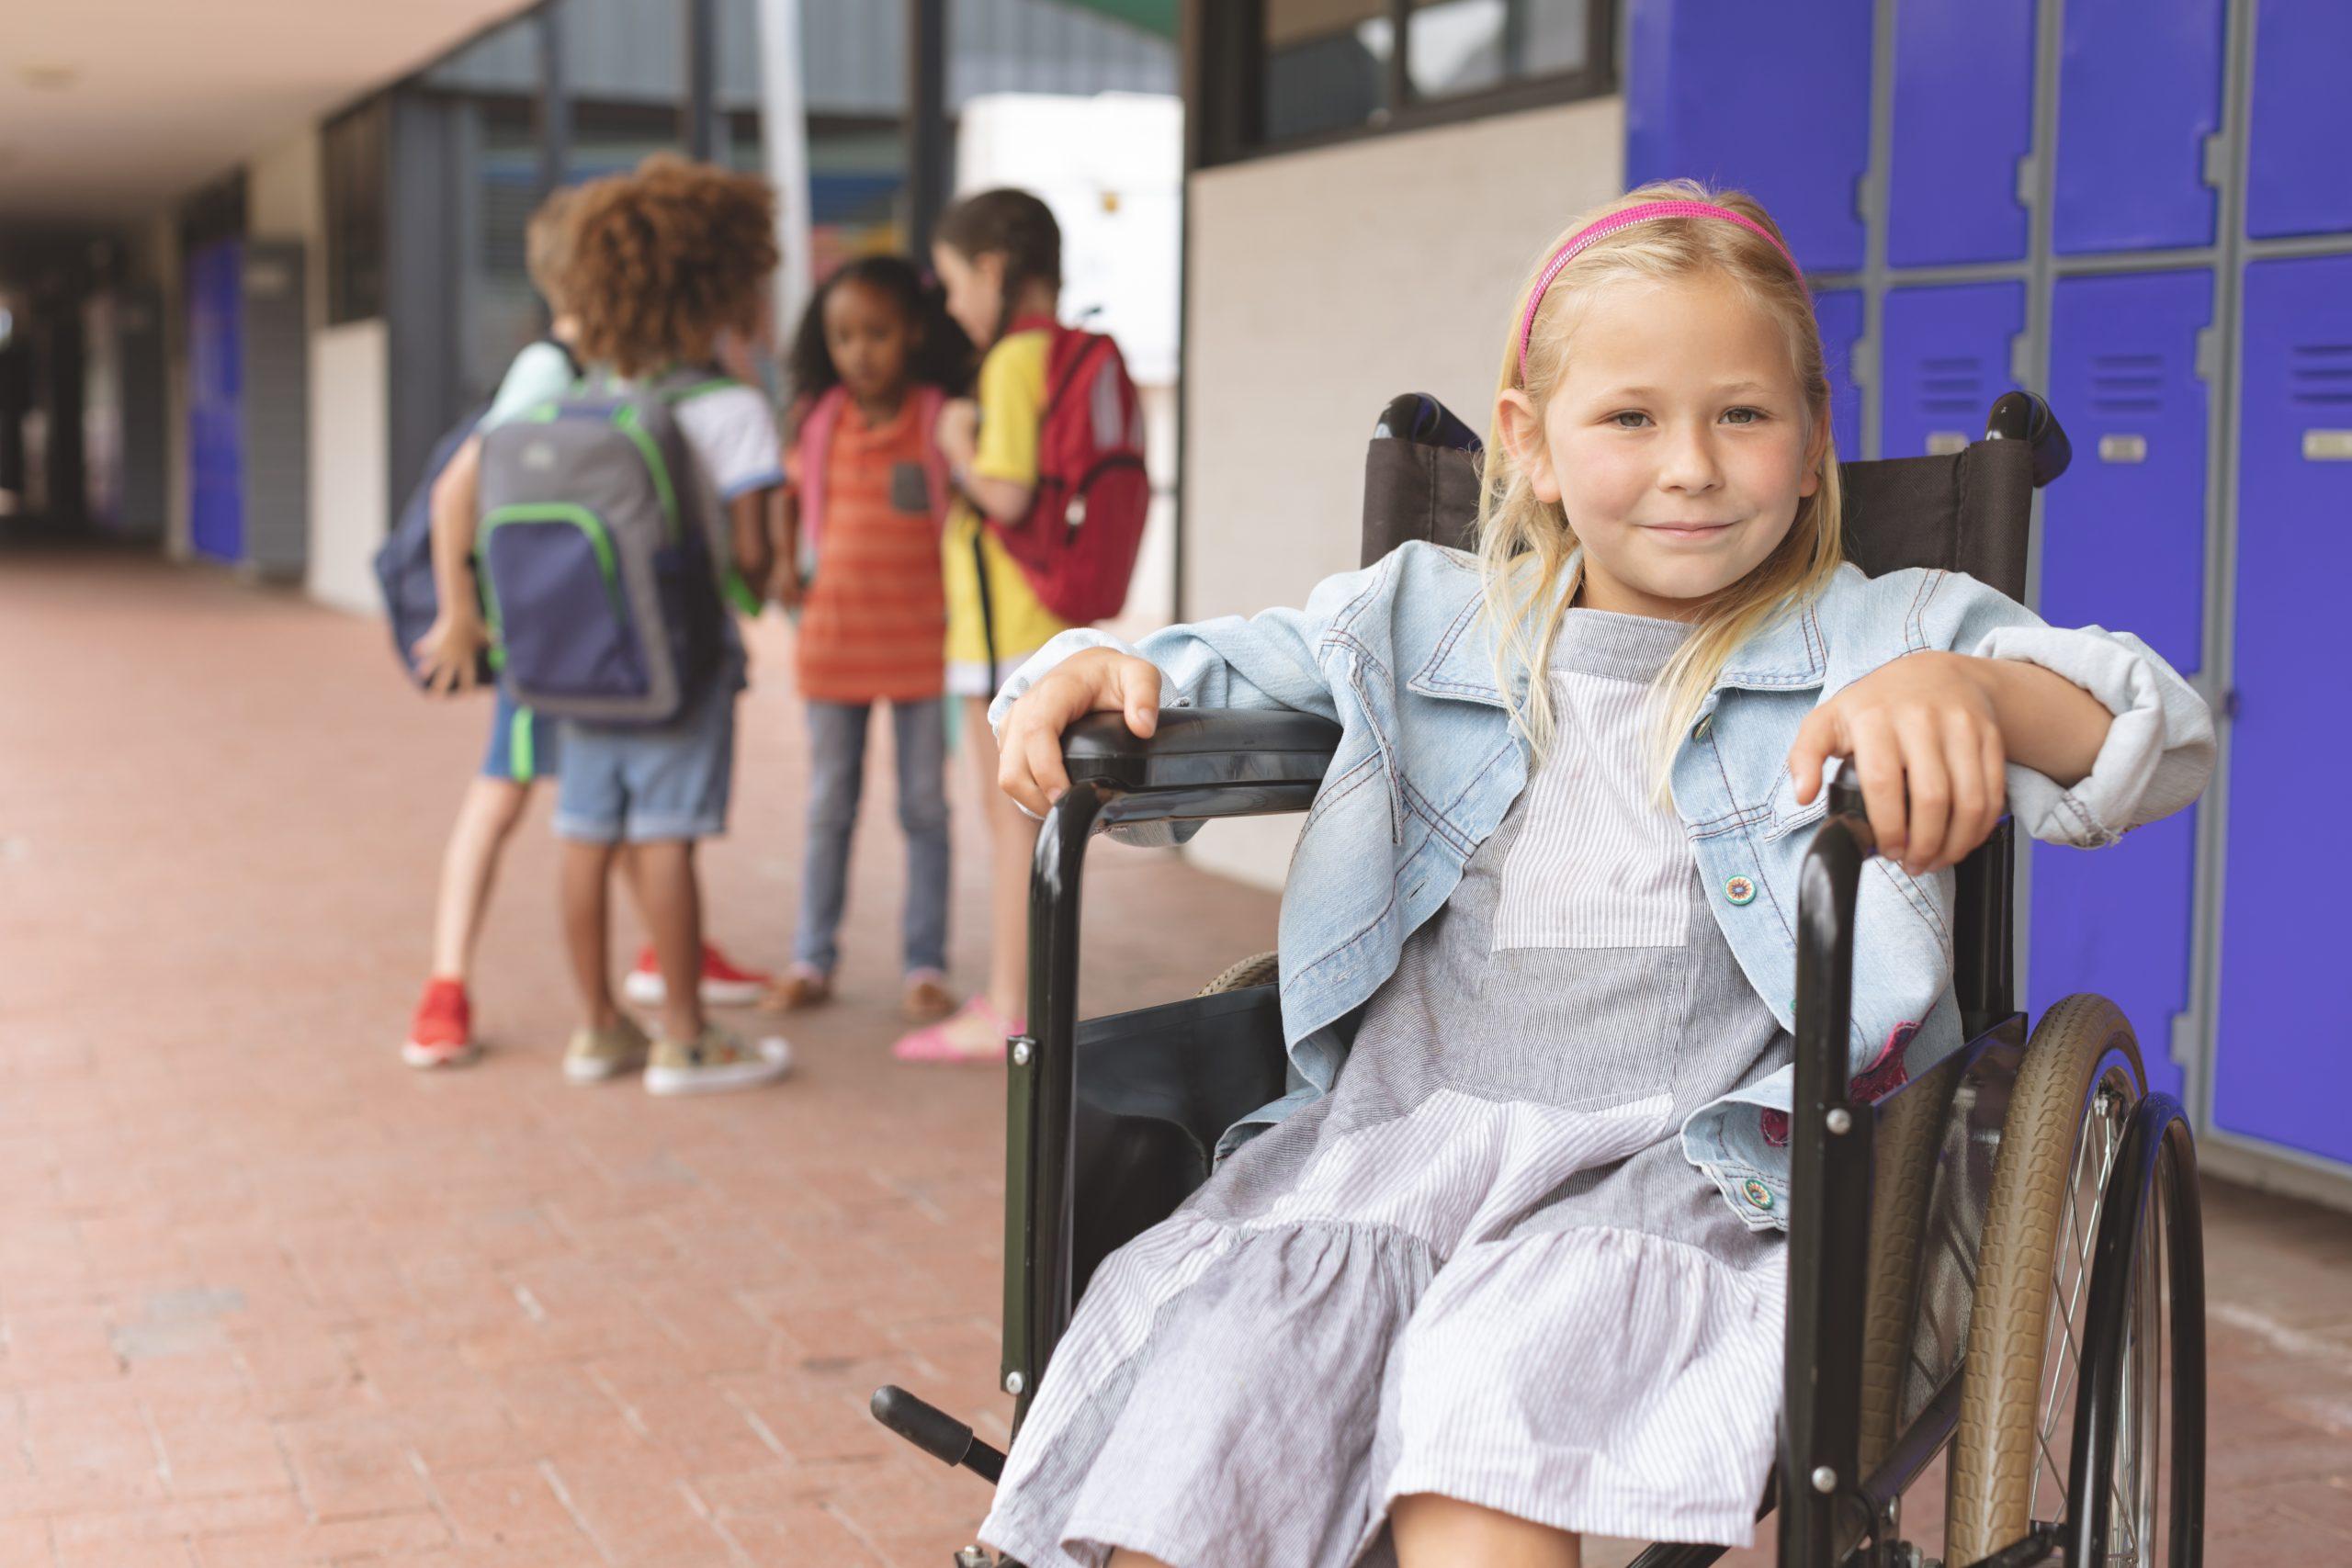 Front view of a schoolgirl sitting on wheelchair in corridor aginst school kids speaking together in background in outside corridor at school